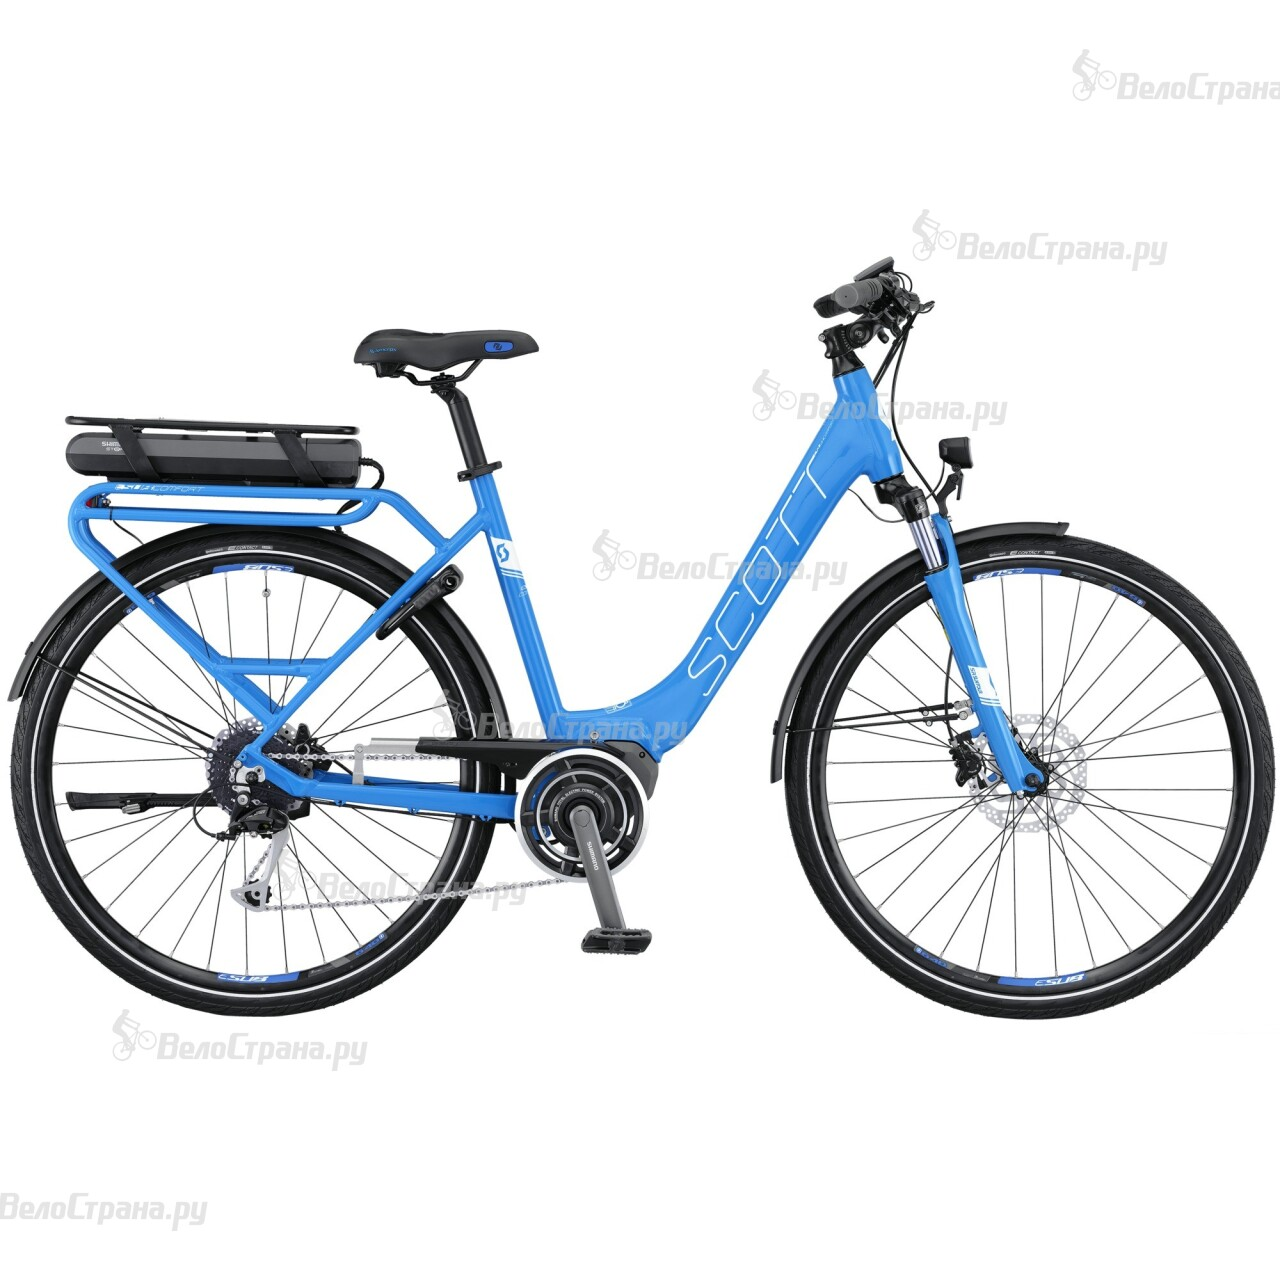 Велосипед Scott E-Sub Comfort Unisex (2016) scott w scott rob roy